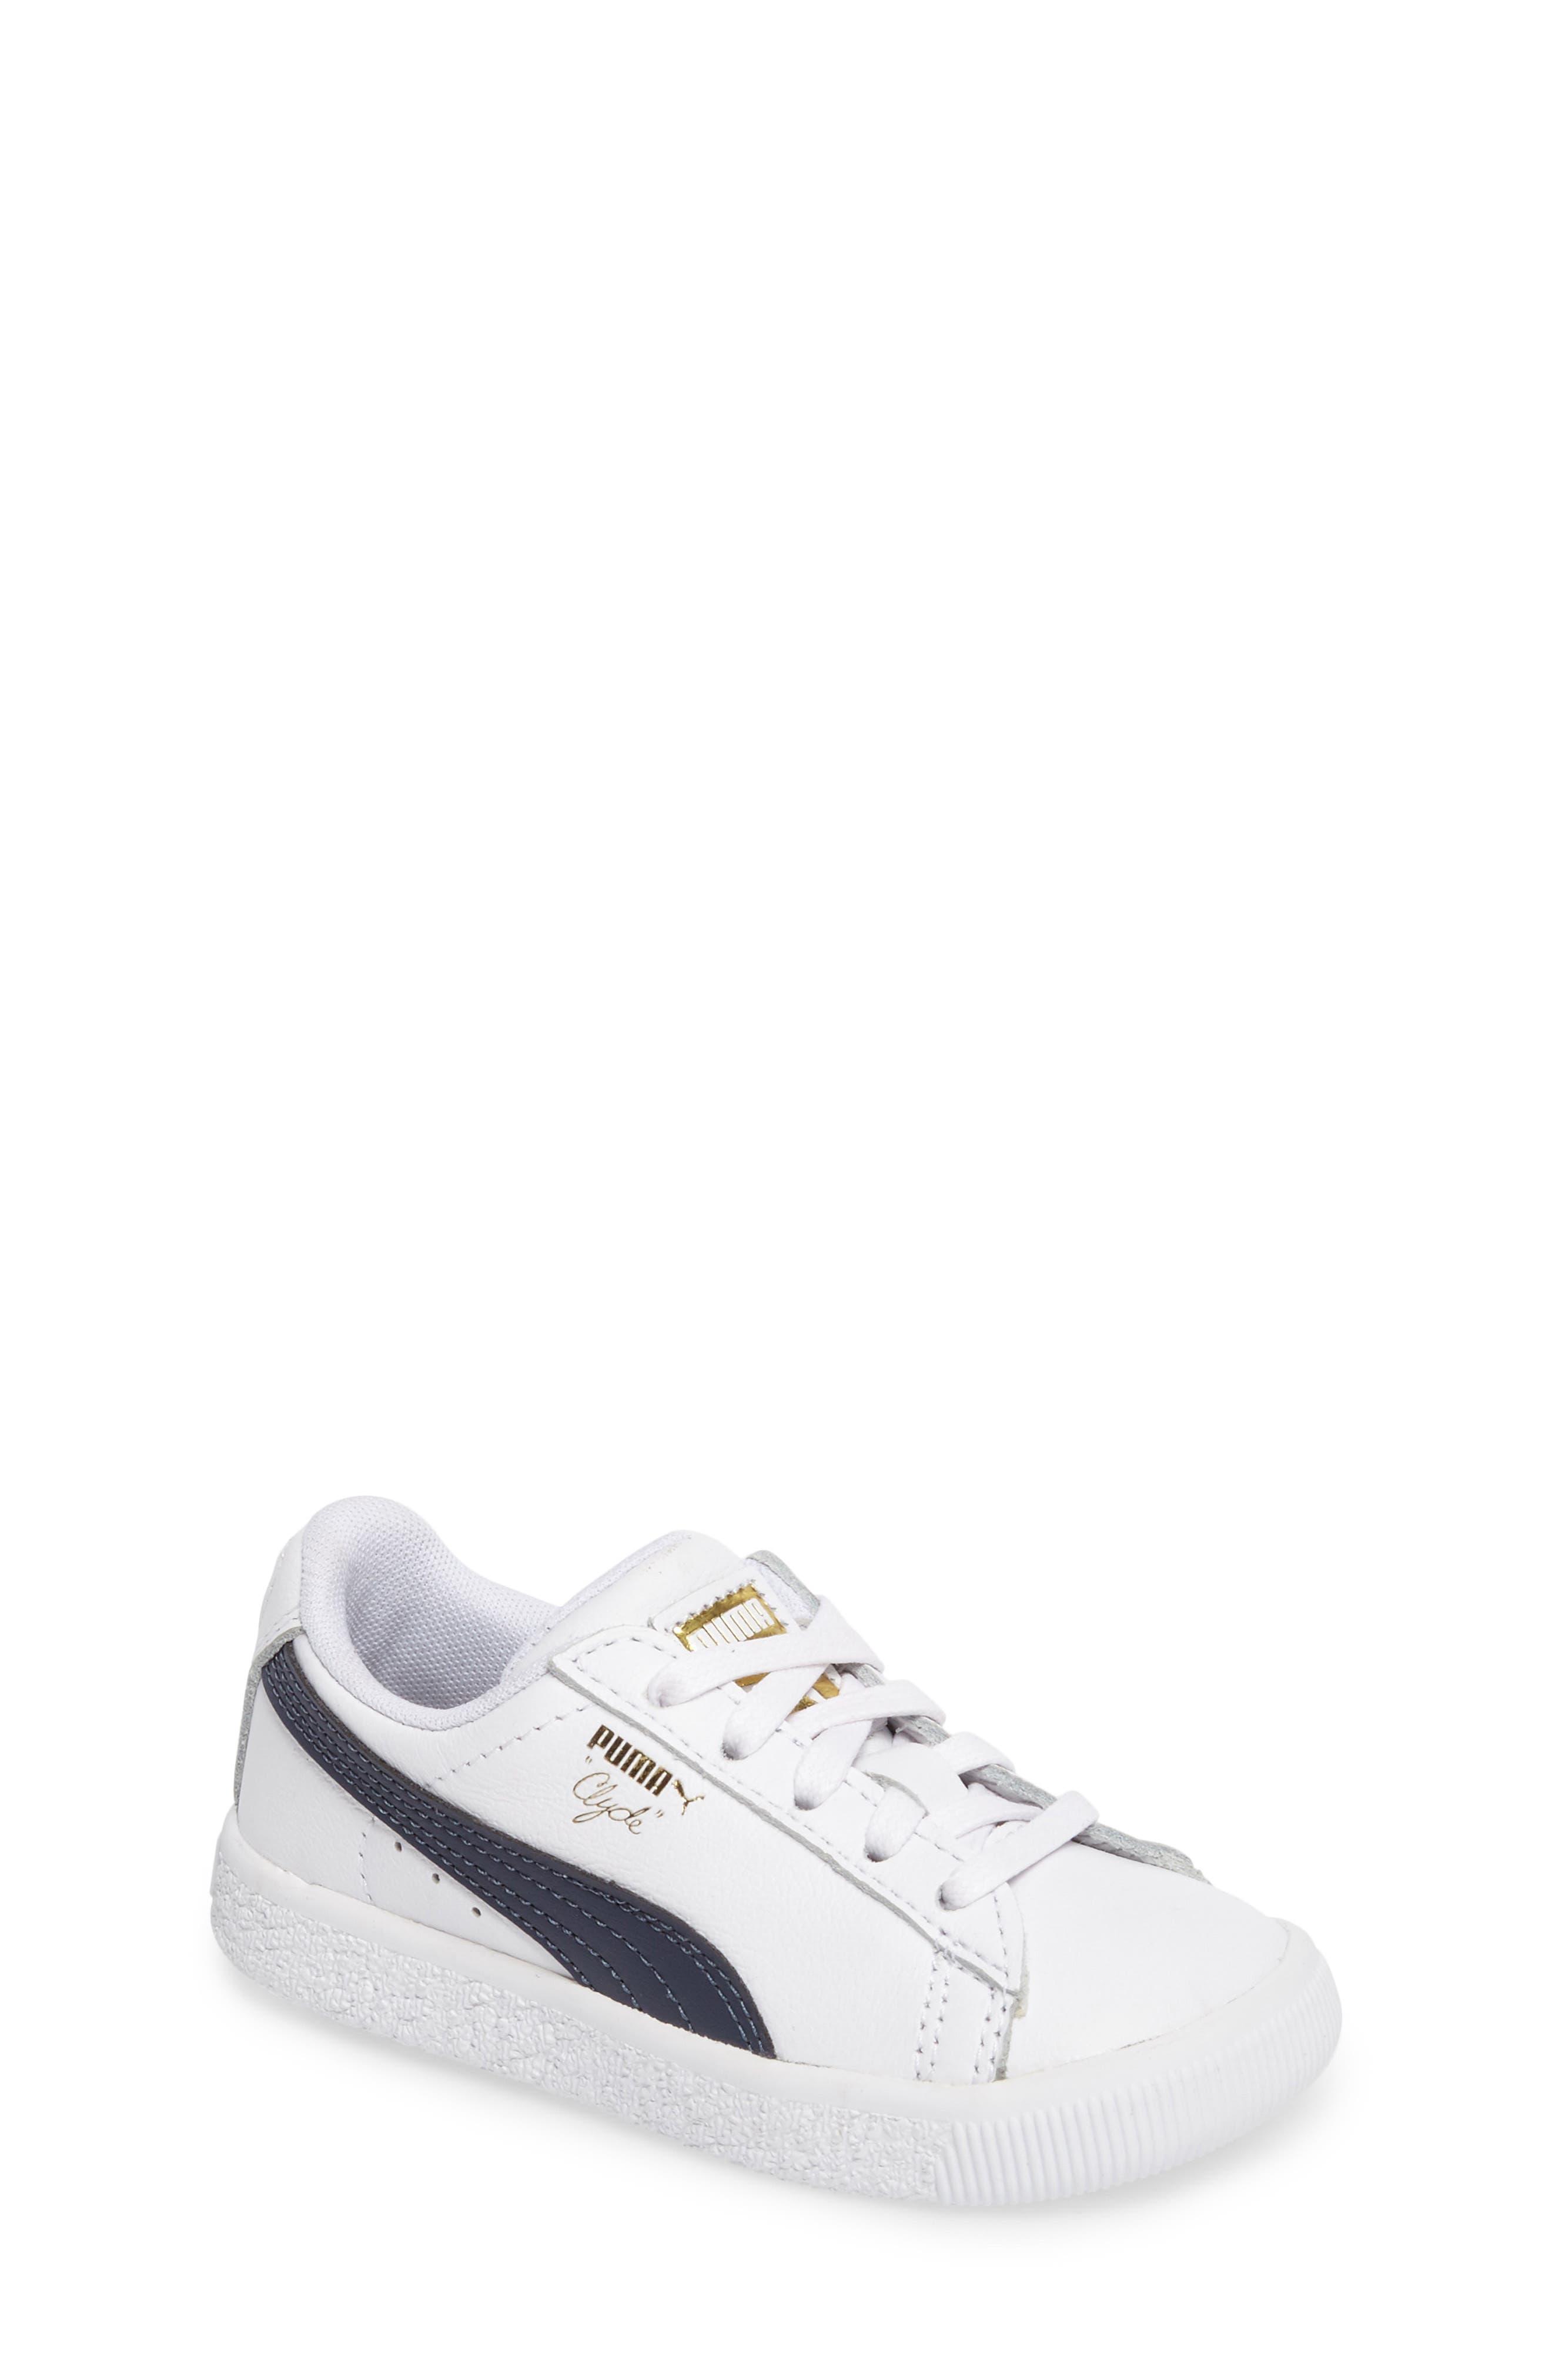 PUMA Clyde Core Foil Sneaker (Baby, Walker & Toddler)